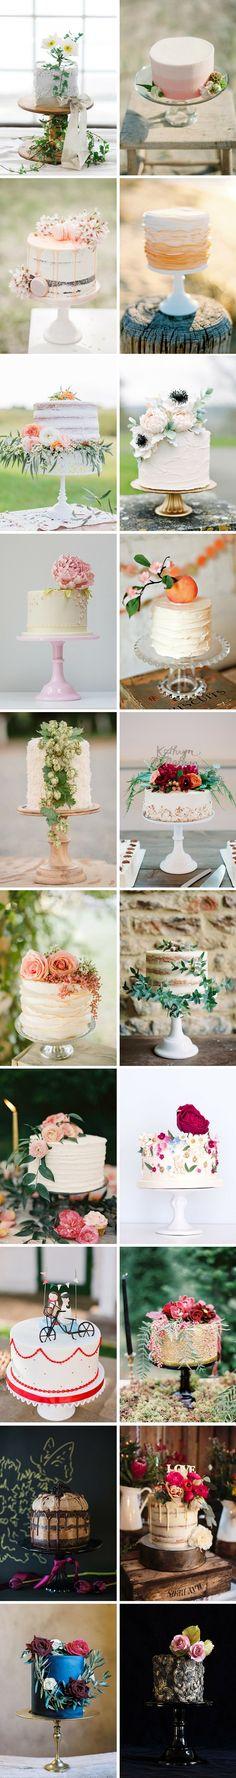 20 Wow Single Tier Wedding Cakes